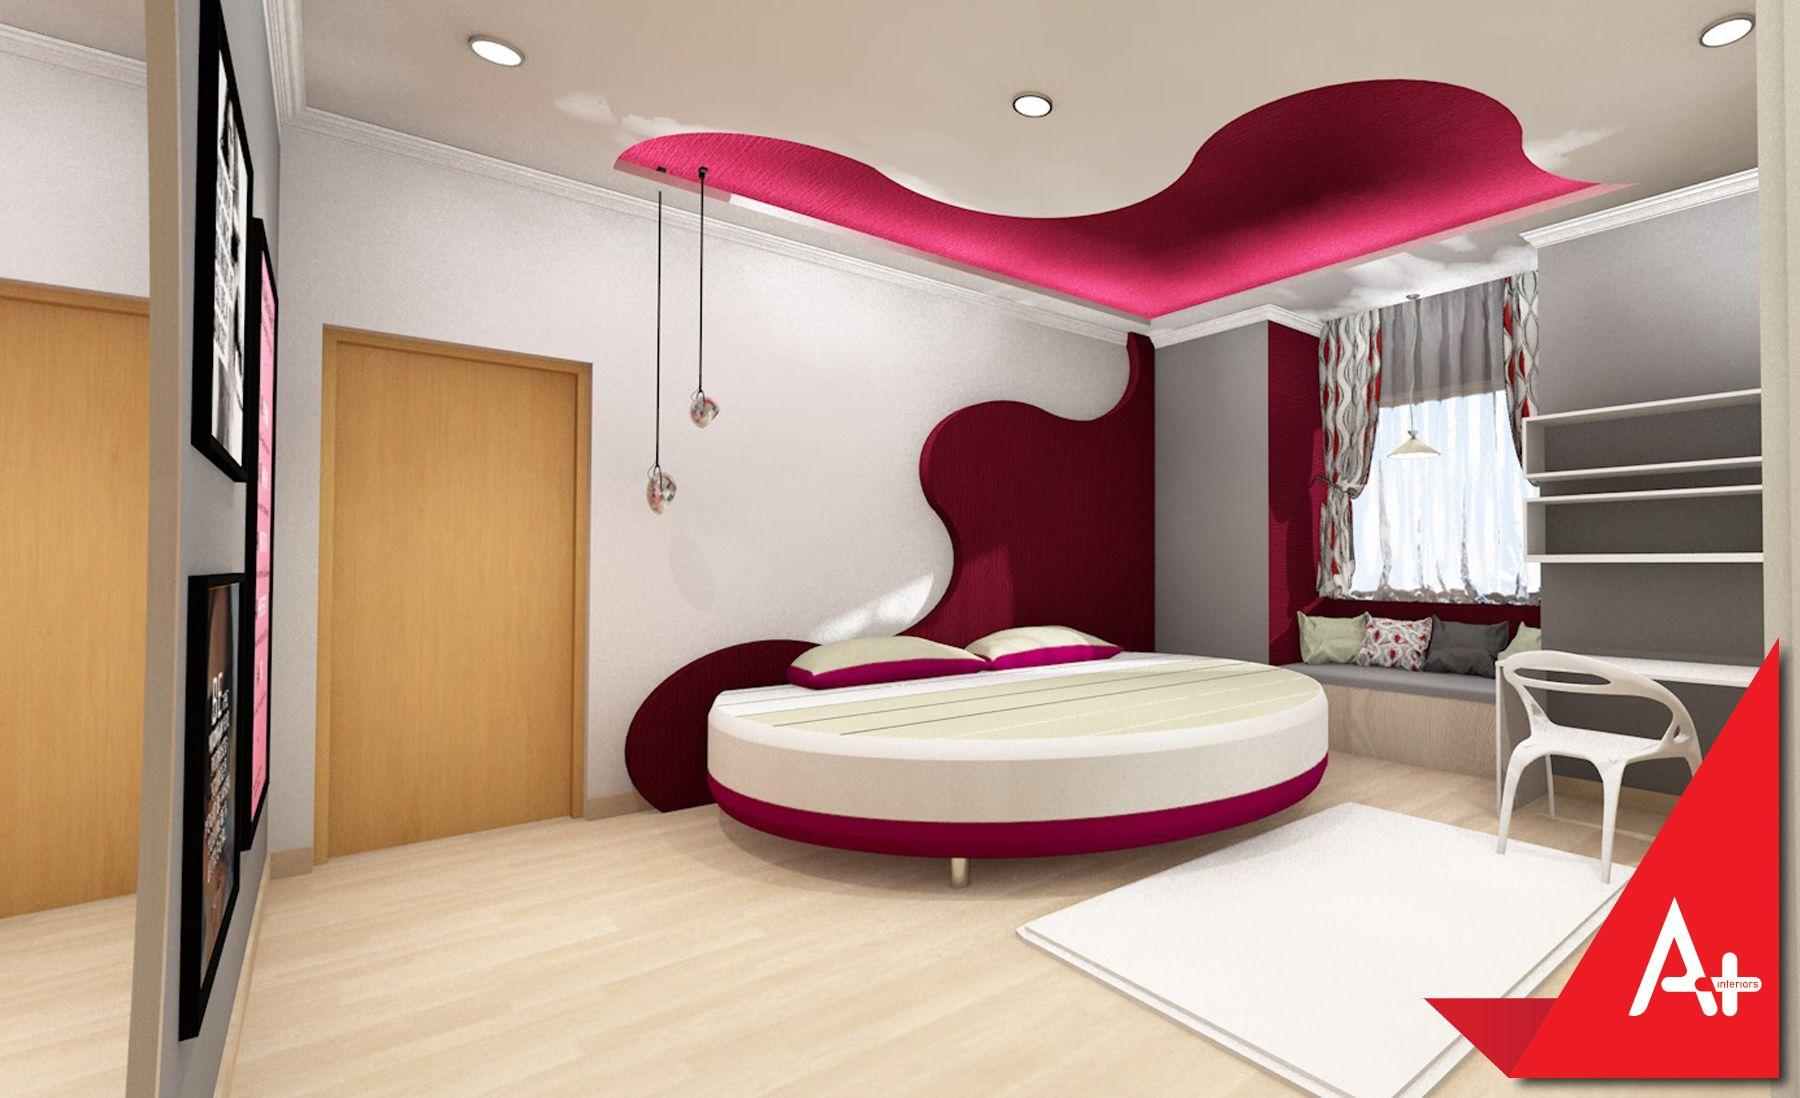 a plus interiors  adult bedroom design young adult